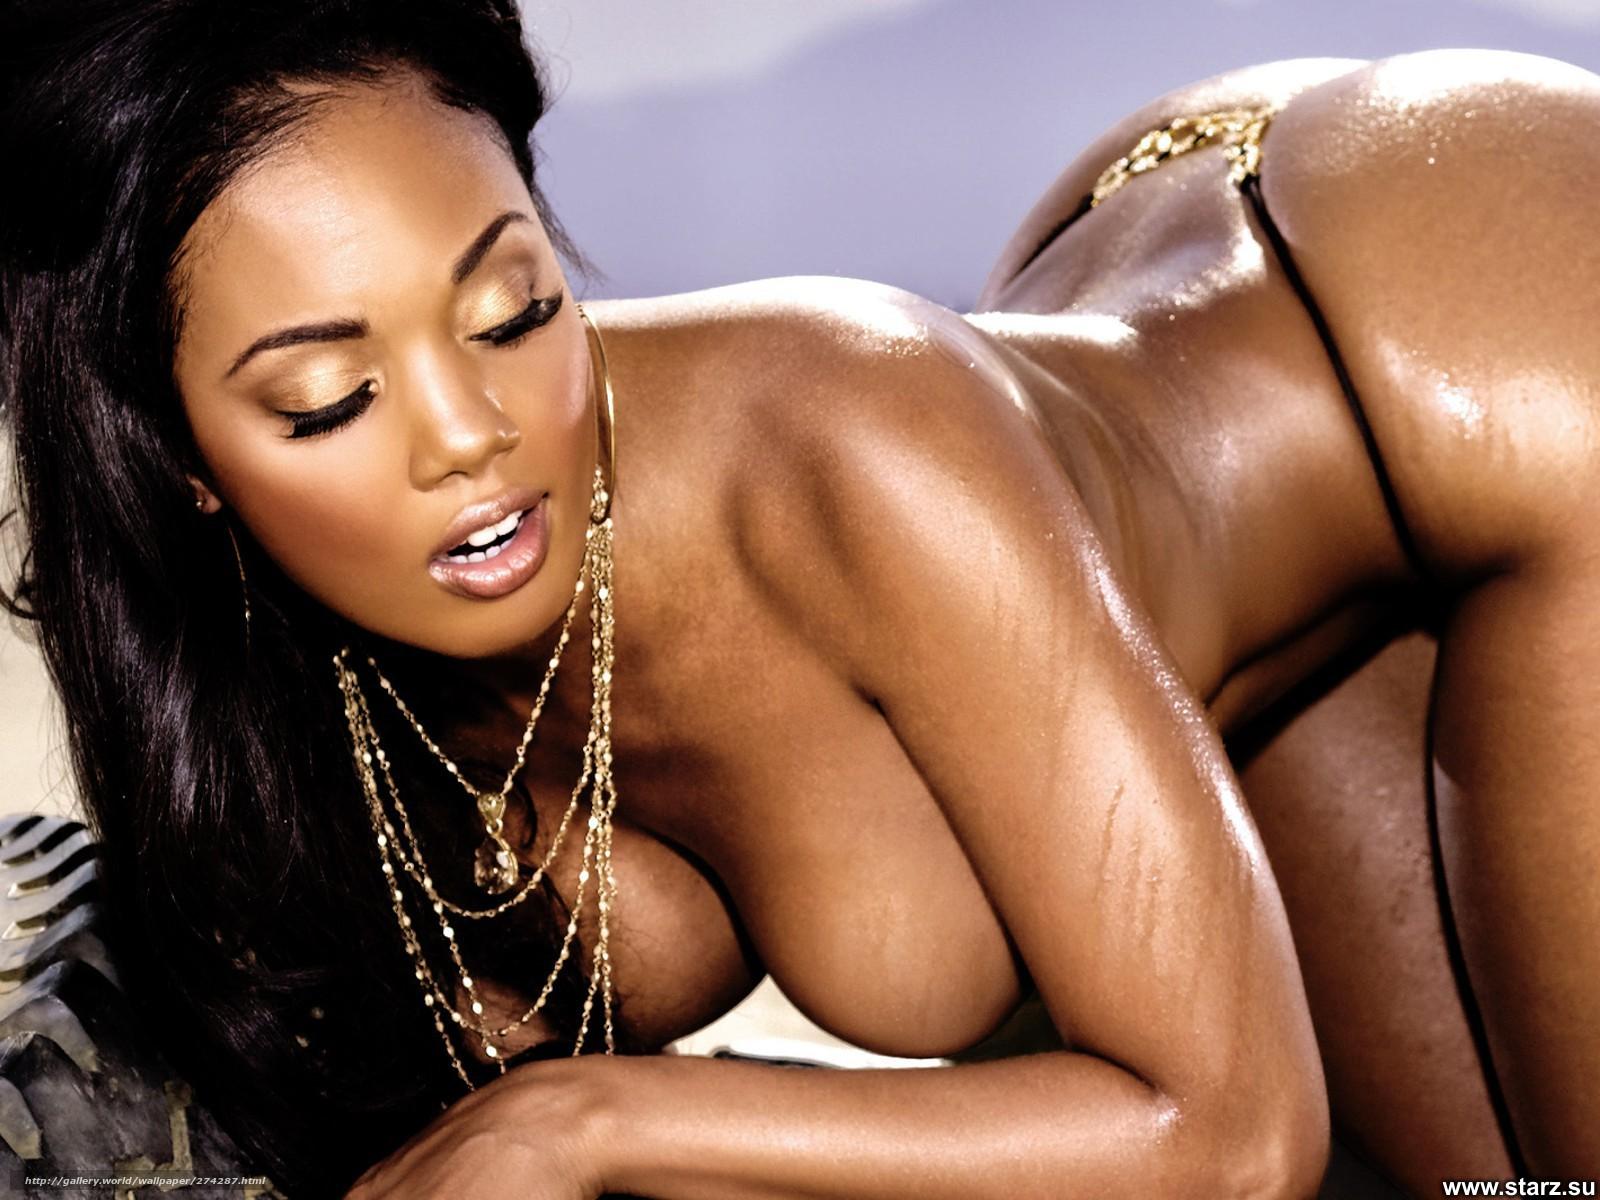 Секс темнокожие девушки 1 фотография